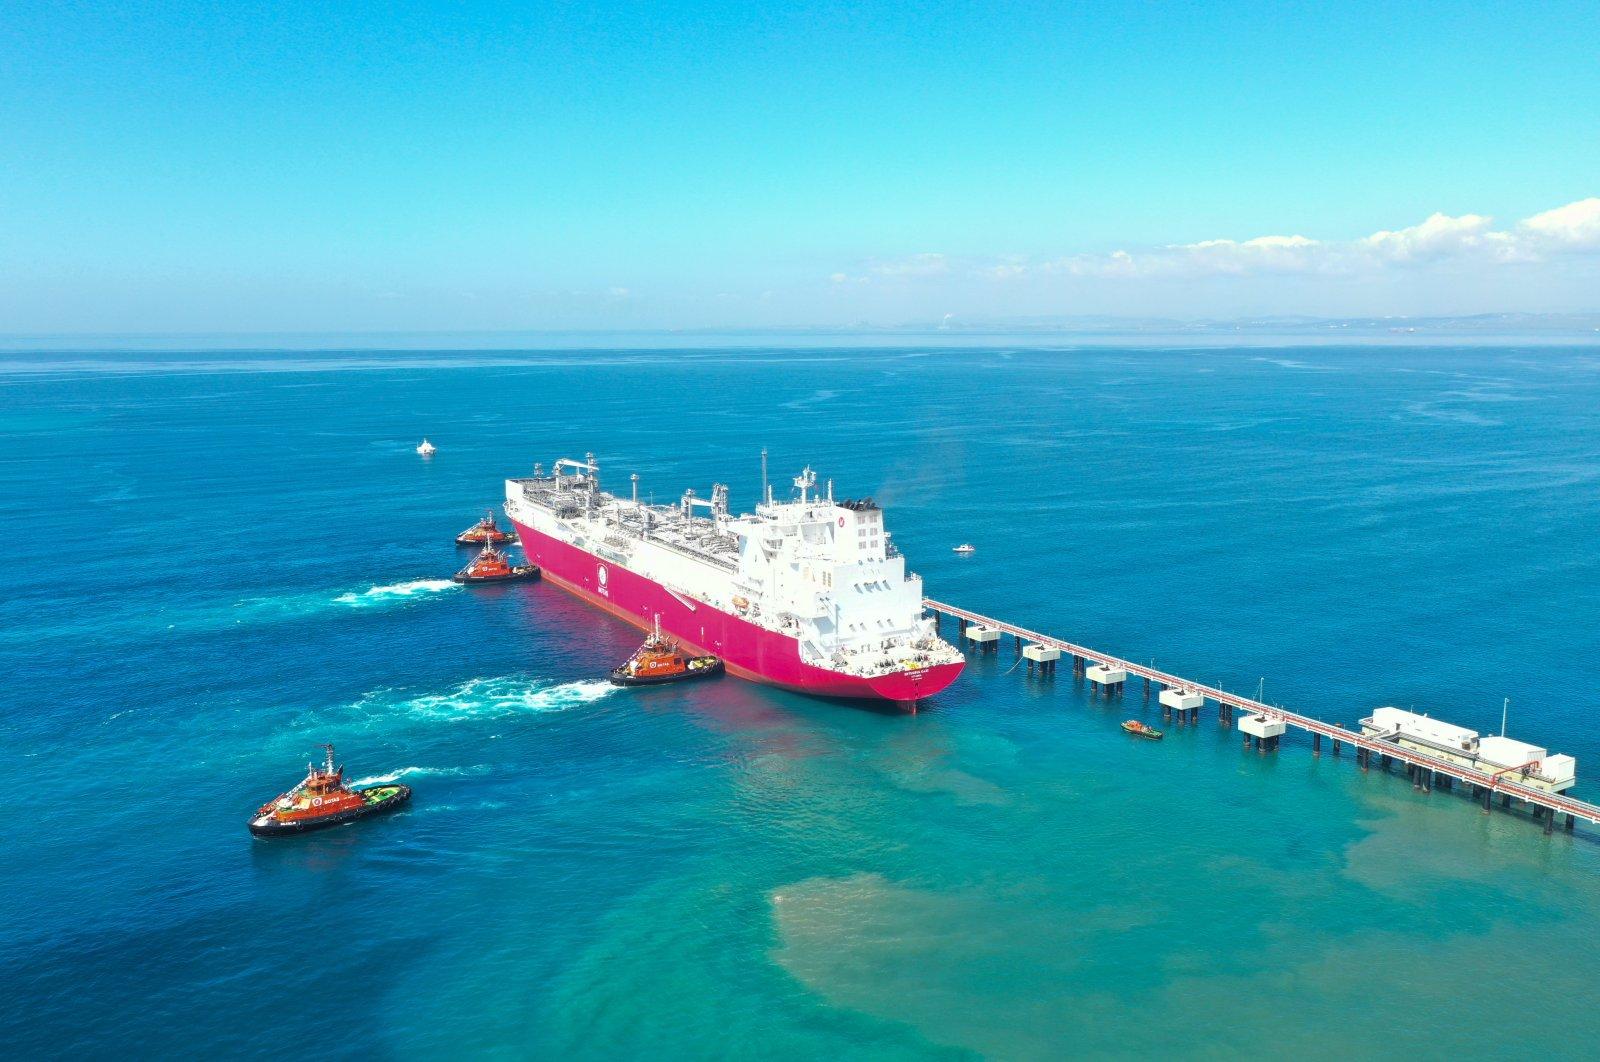 Turkey's first floating storage and regasification unit (FSRU) Ertuğrul Gazi arrives at the port in Dörtyol in Turkey's southern province of Hatay, Turkey, April 22, 2021. (AA Photo)